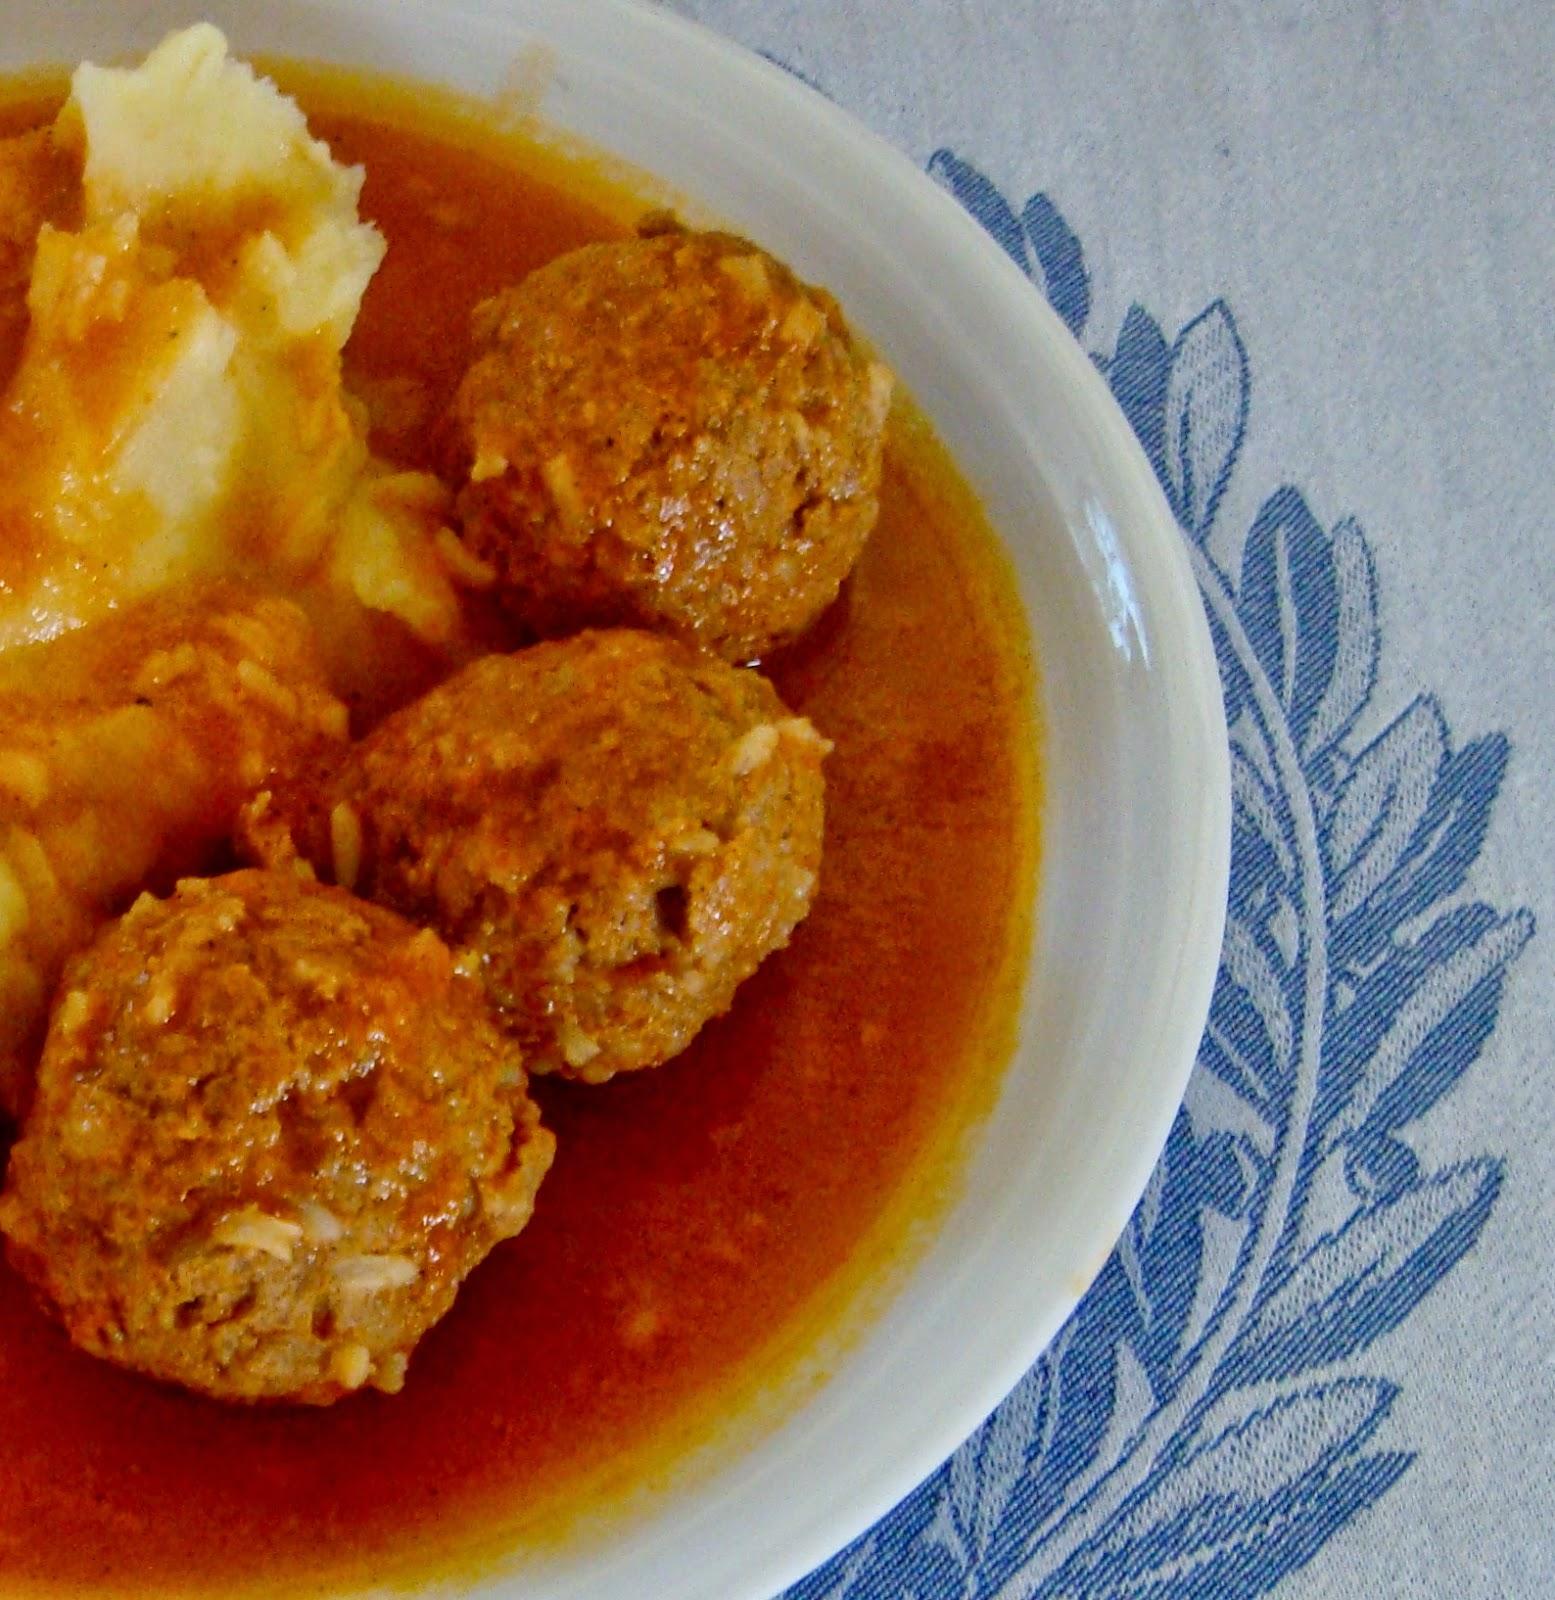 Youverlakia greekerthanthegreeks.blogspot.com